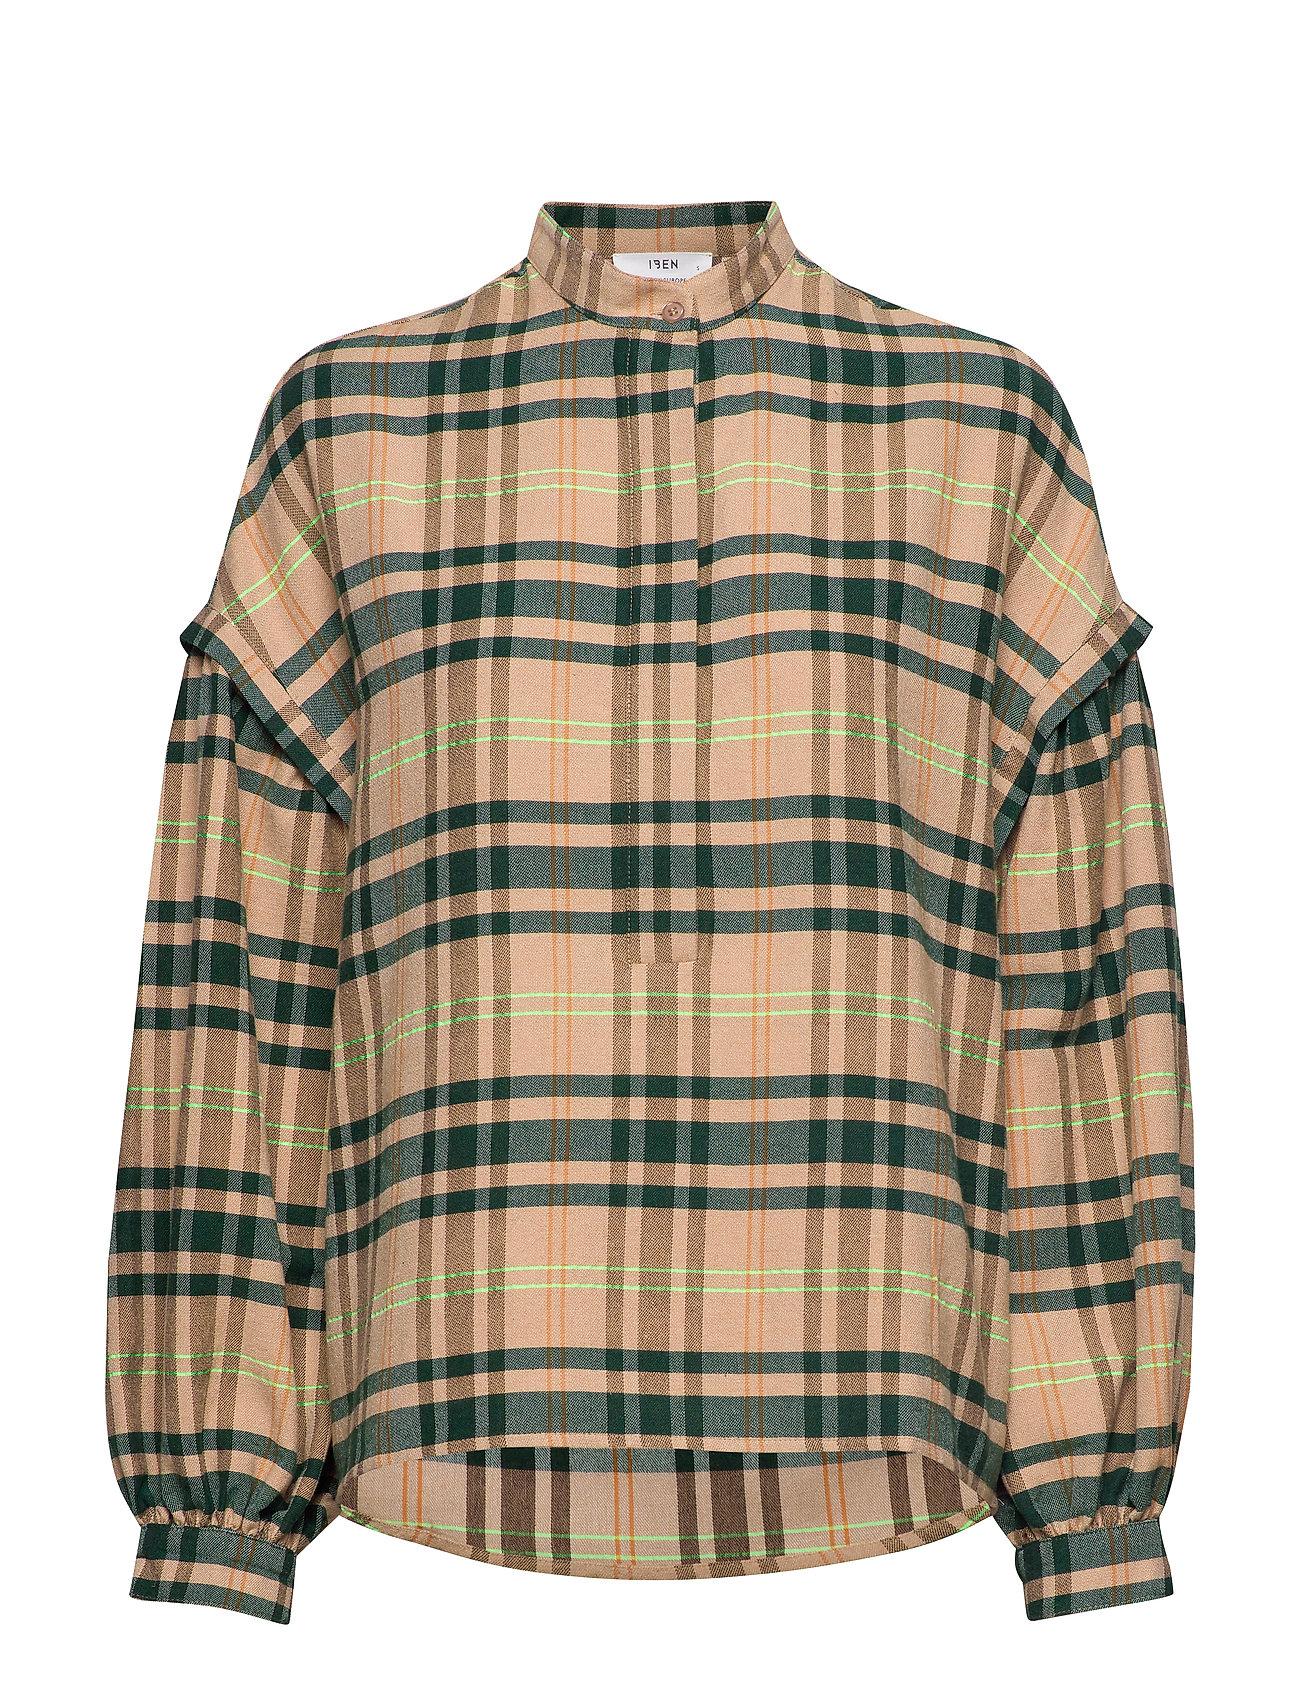 IBEN Charles Shirt ST - MOONLIGHT